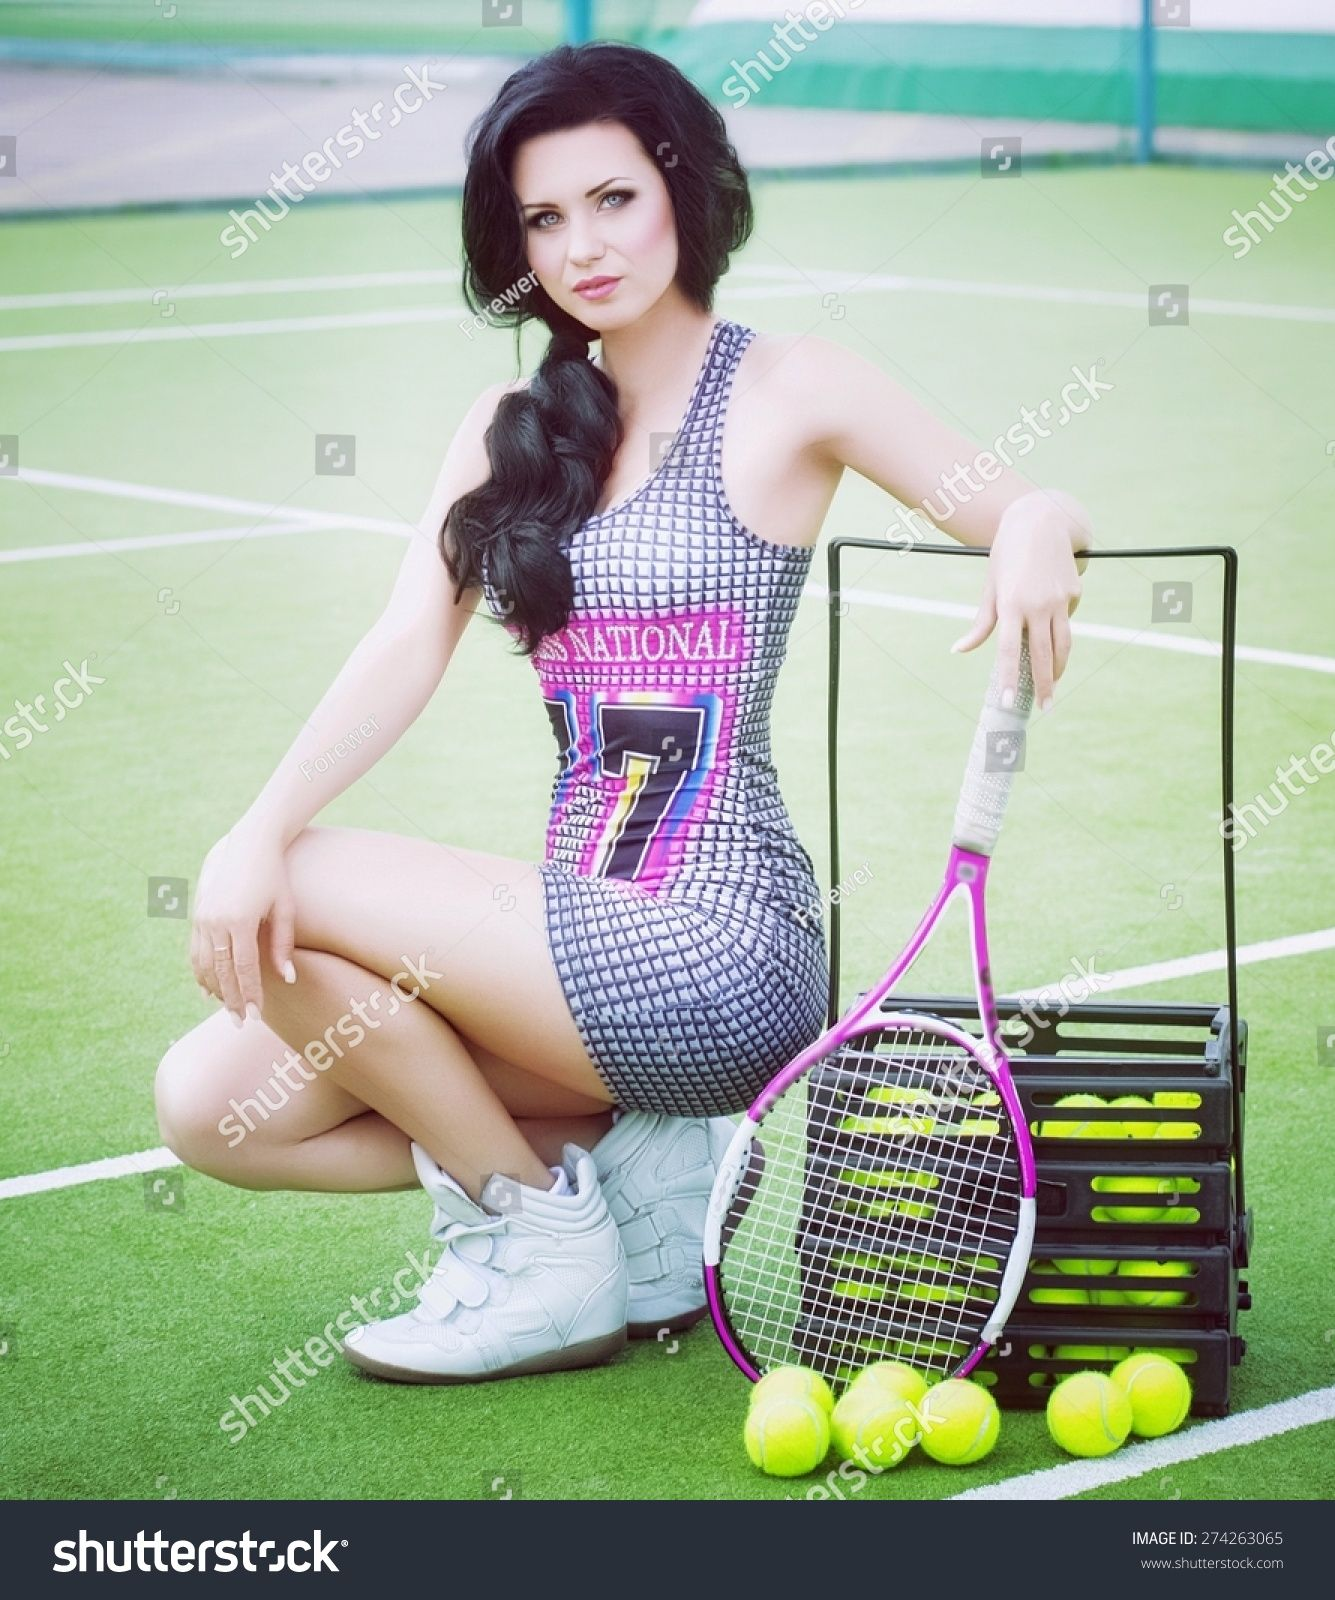 Beautiful Woman Playing Tennis Ad Ad Woman Beautiful Tennis Playing In 2020 Photo Editing Stock Photos Mockup Design